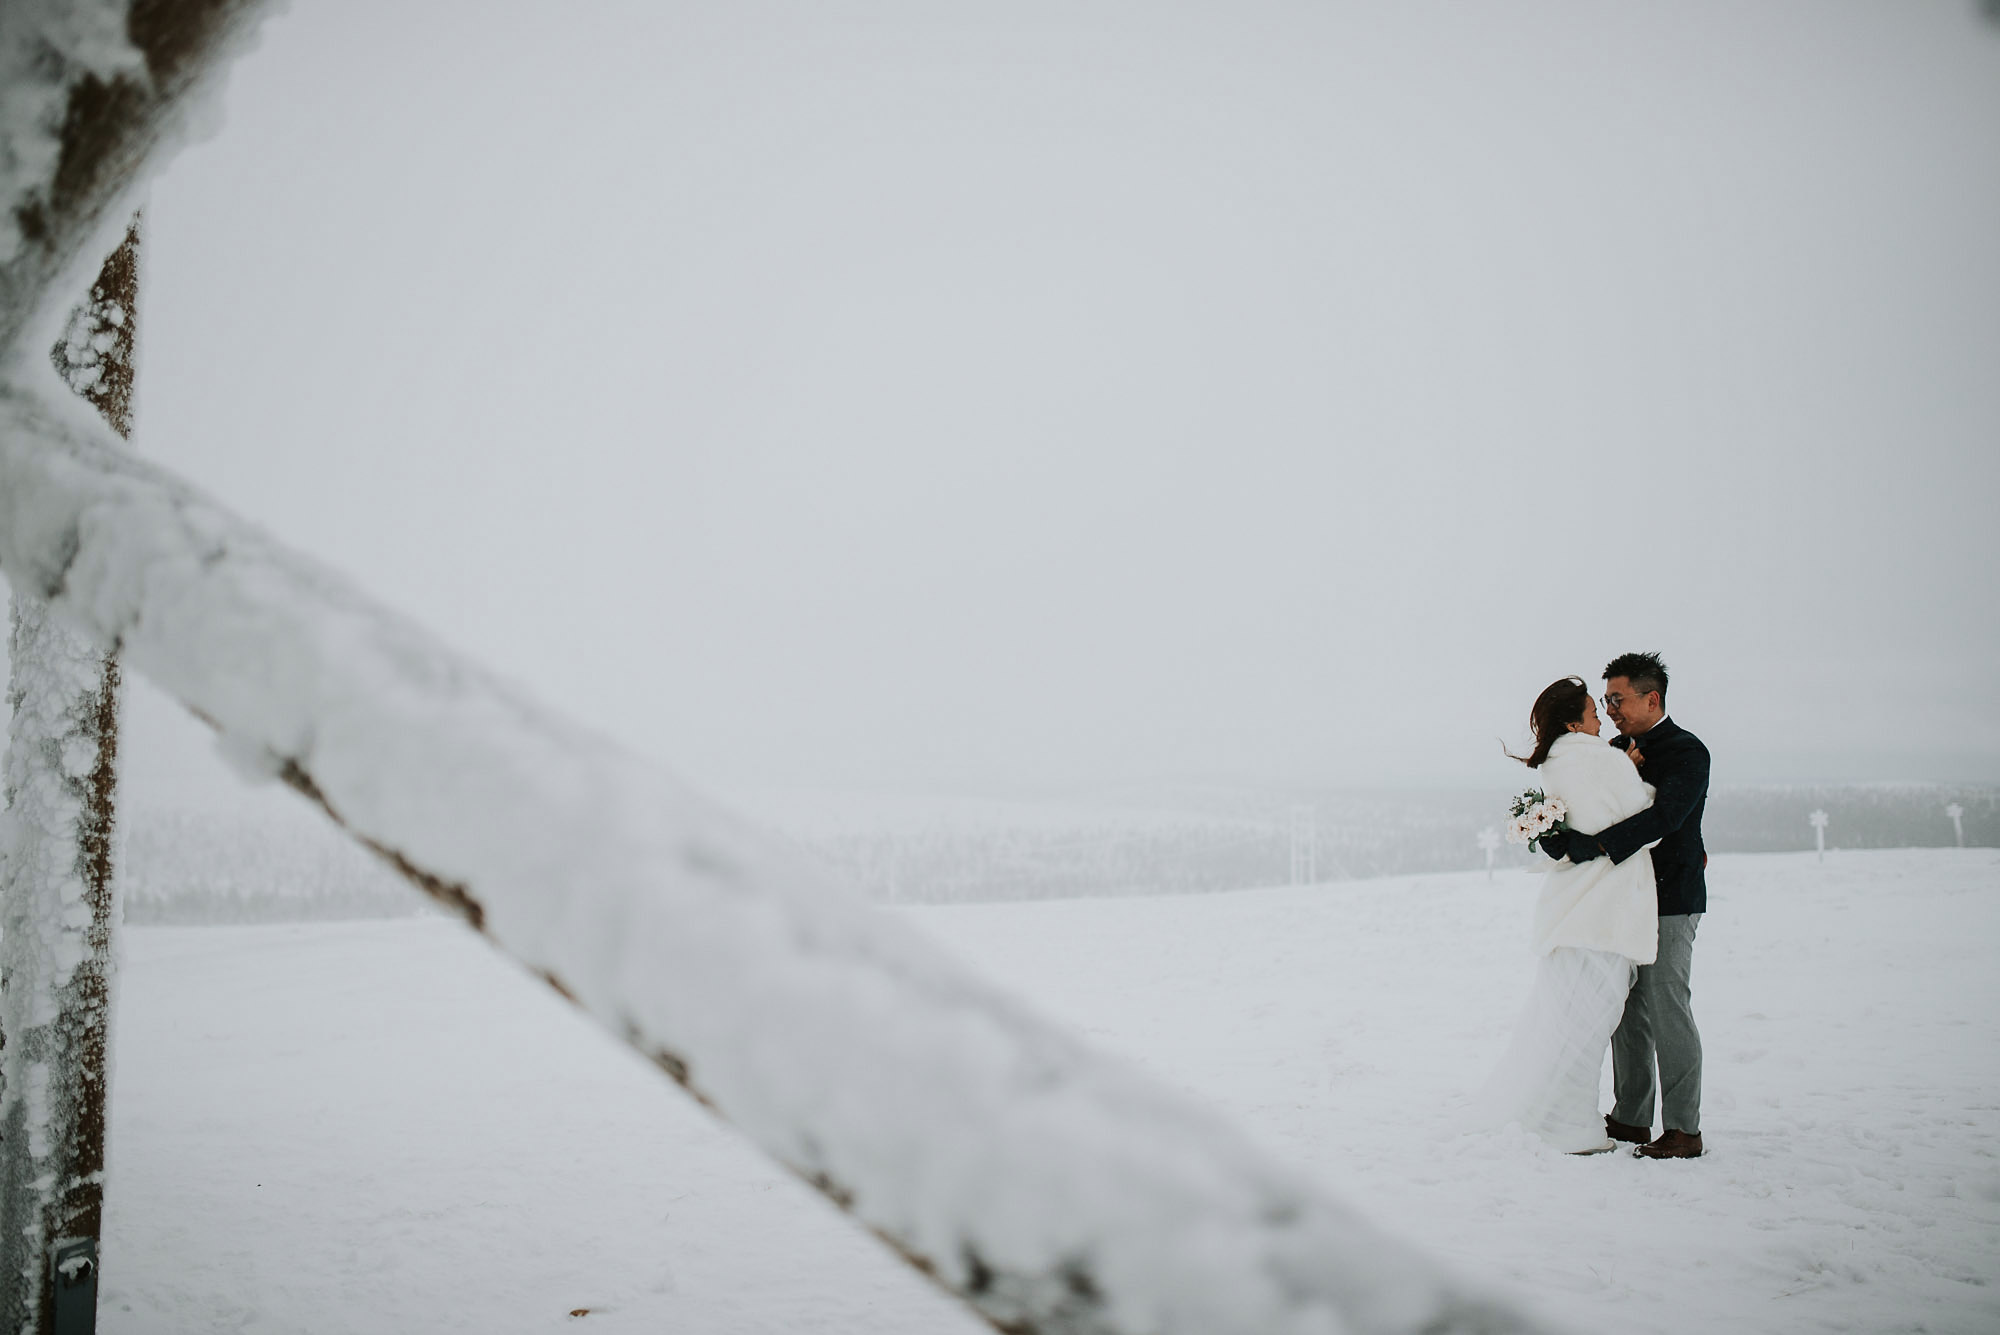 levi-ice-chapel-weddings-lapland-finland-photographer-jere-satamo-020-blog.jpg